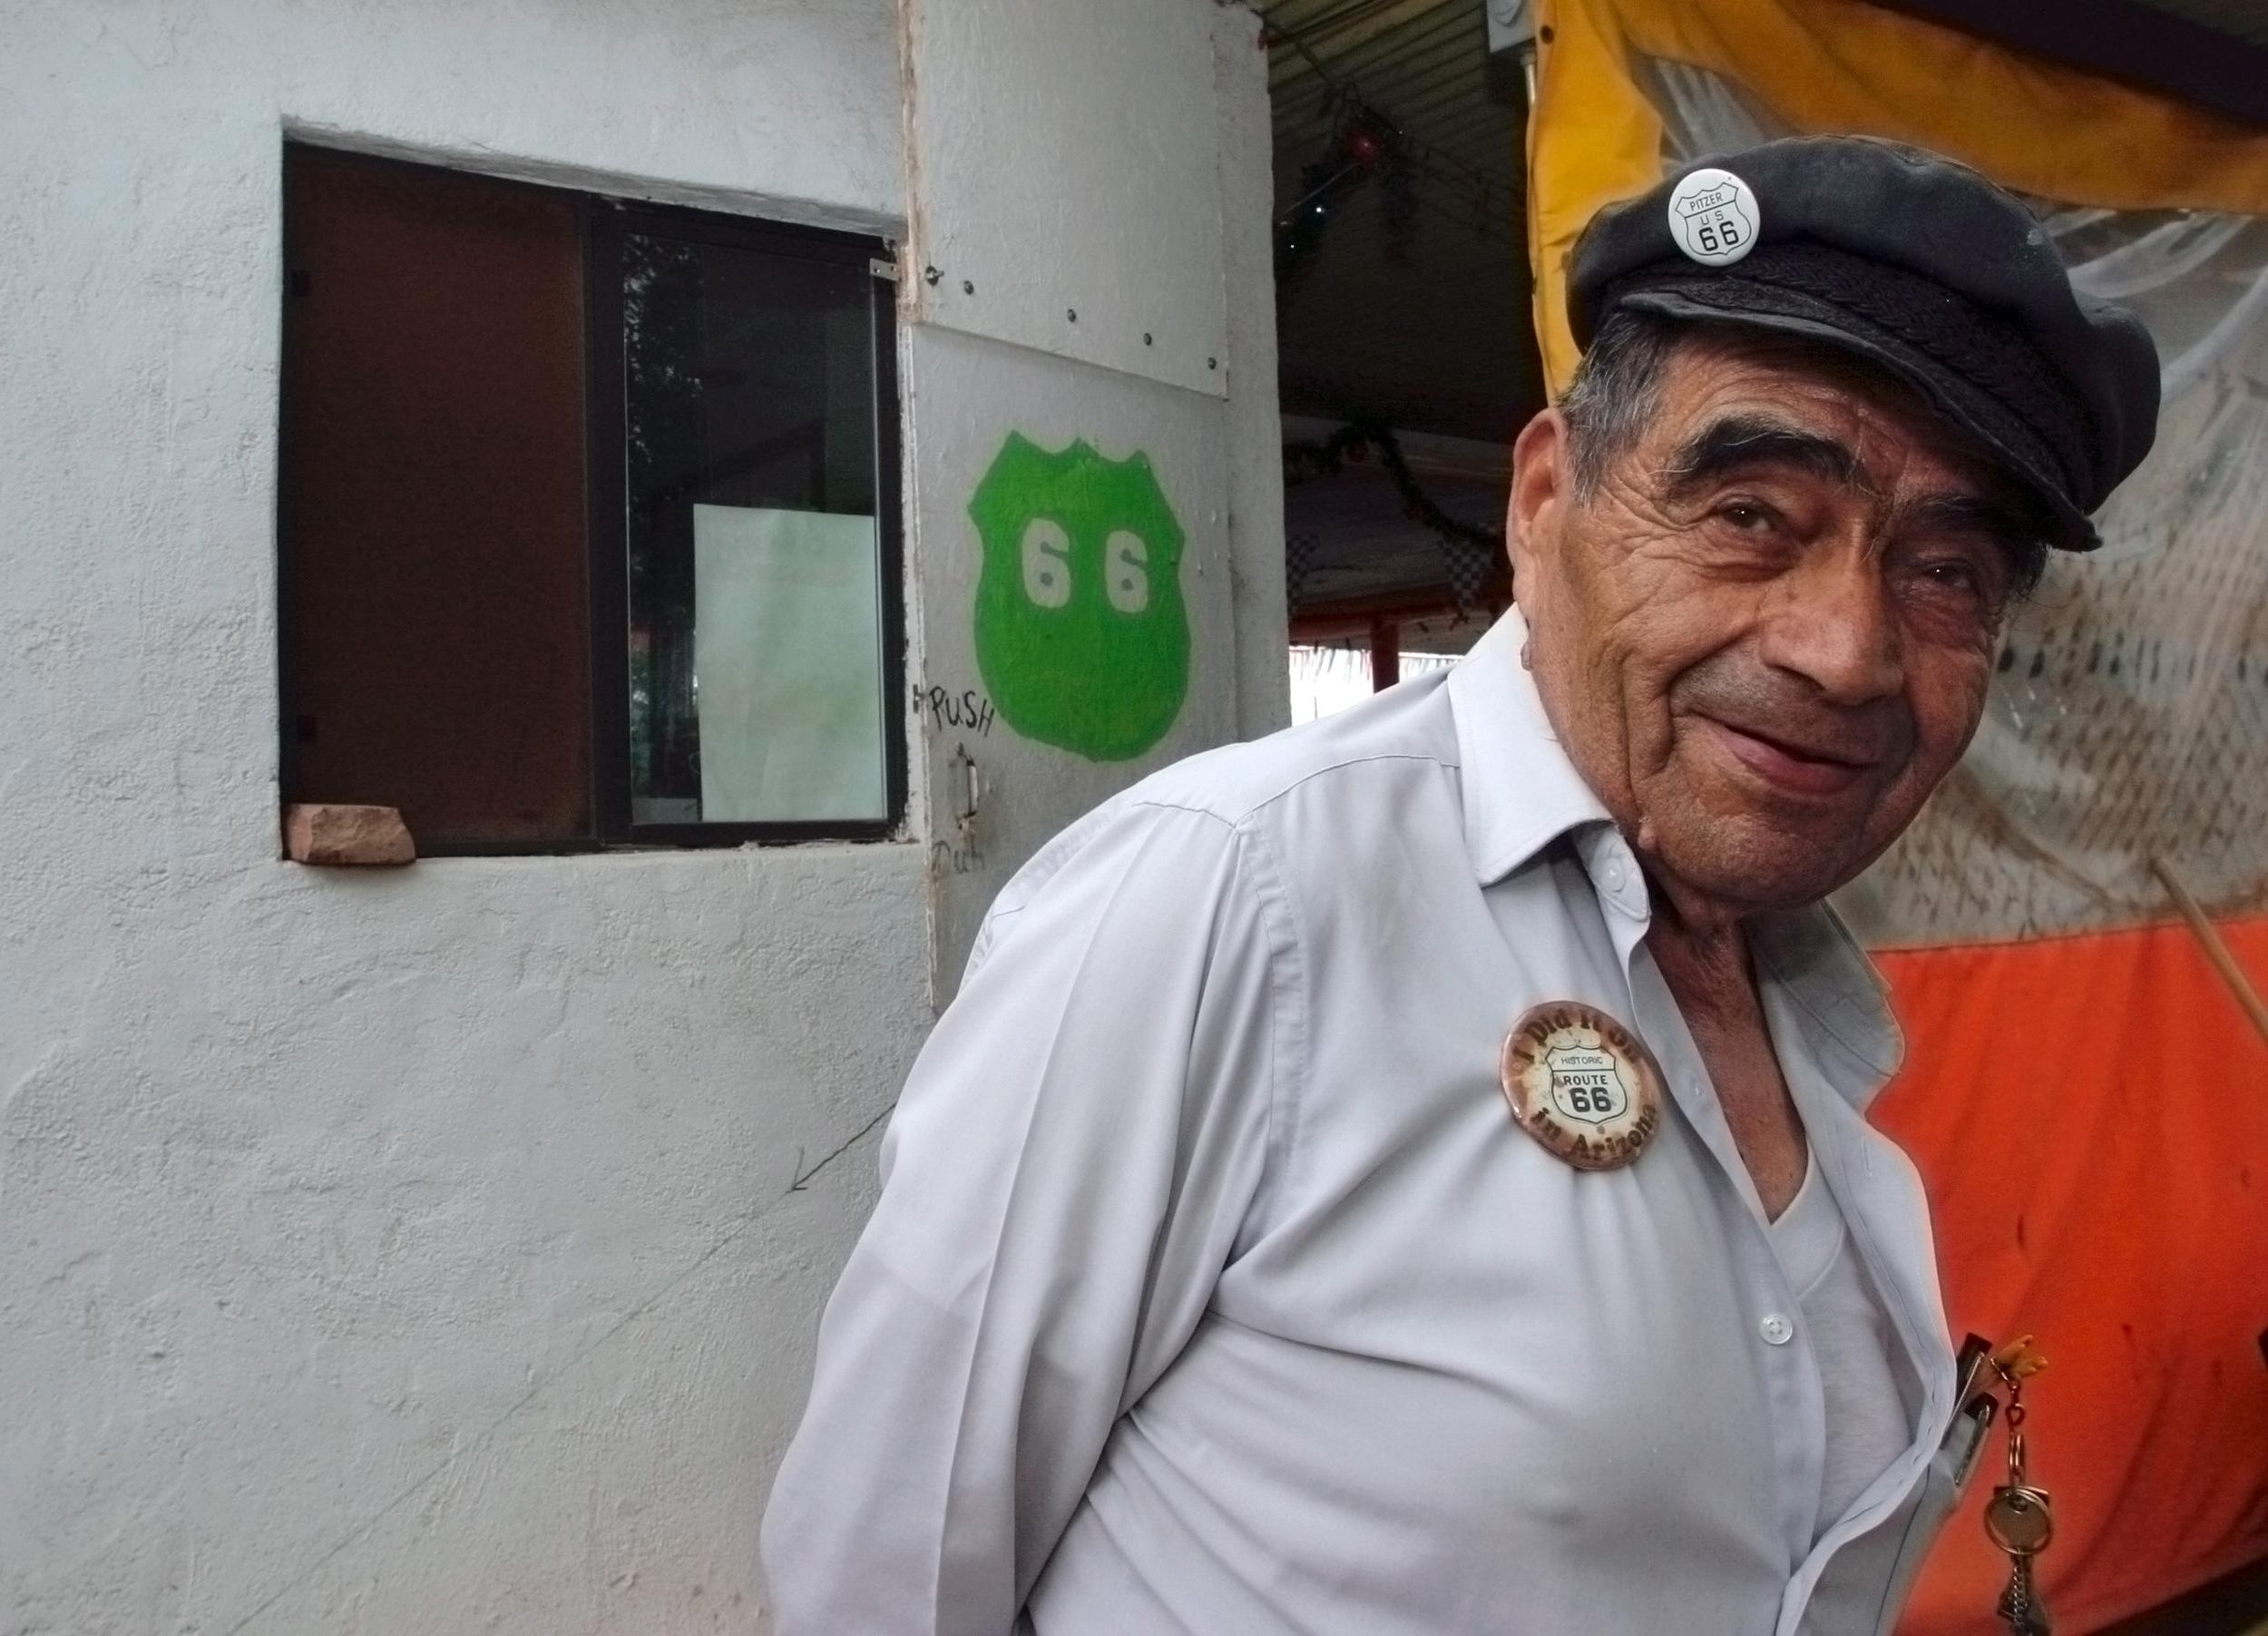 Juan Delgadillo owner of Snowcap, the iconic Route 66 eatery in Seligman, Arizona.